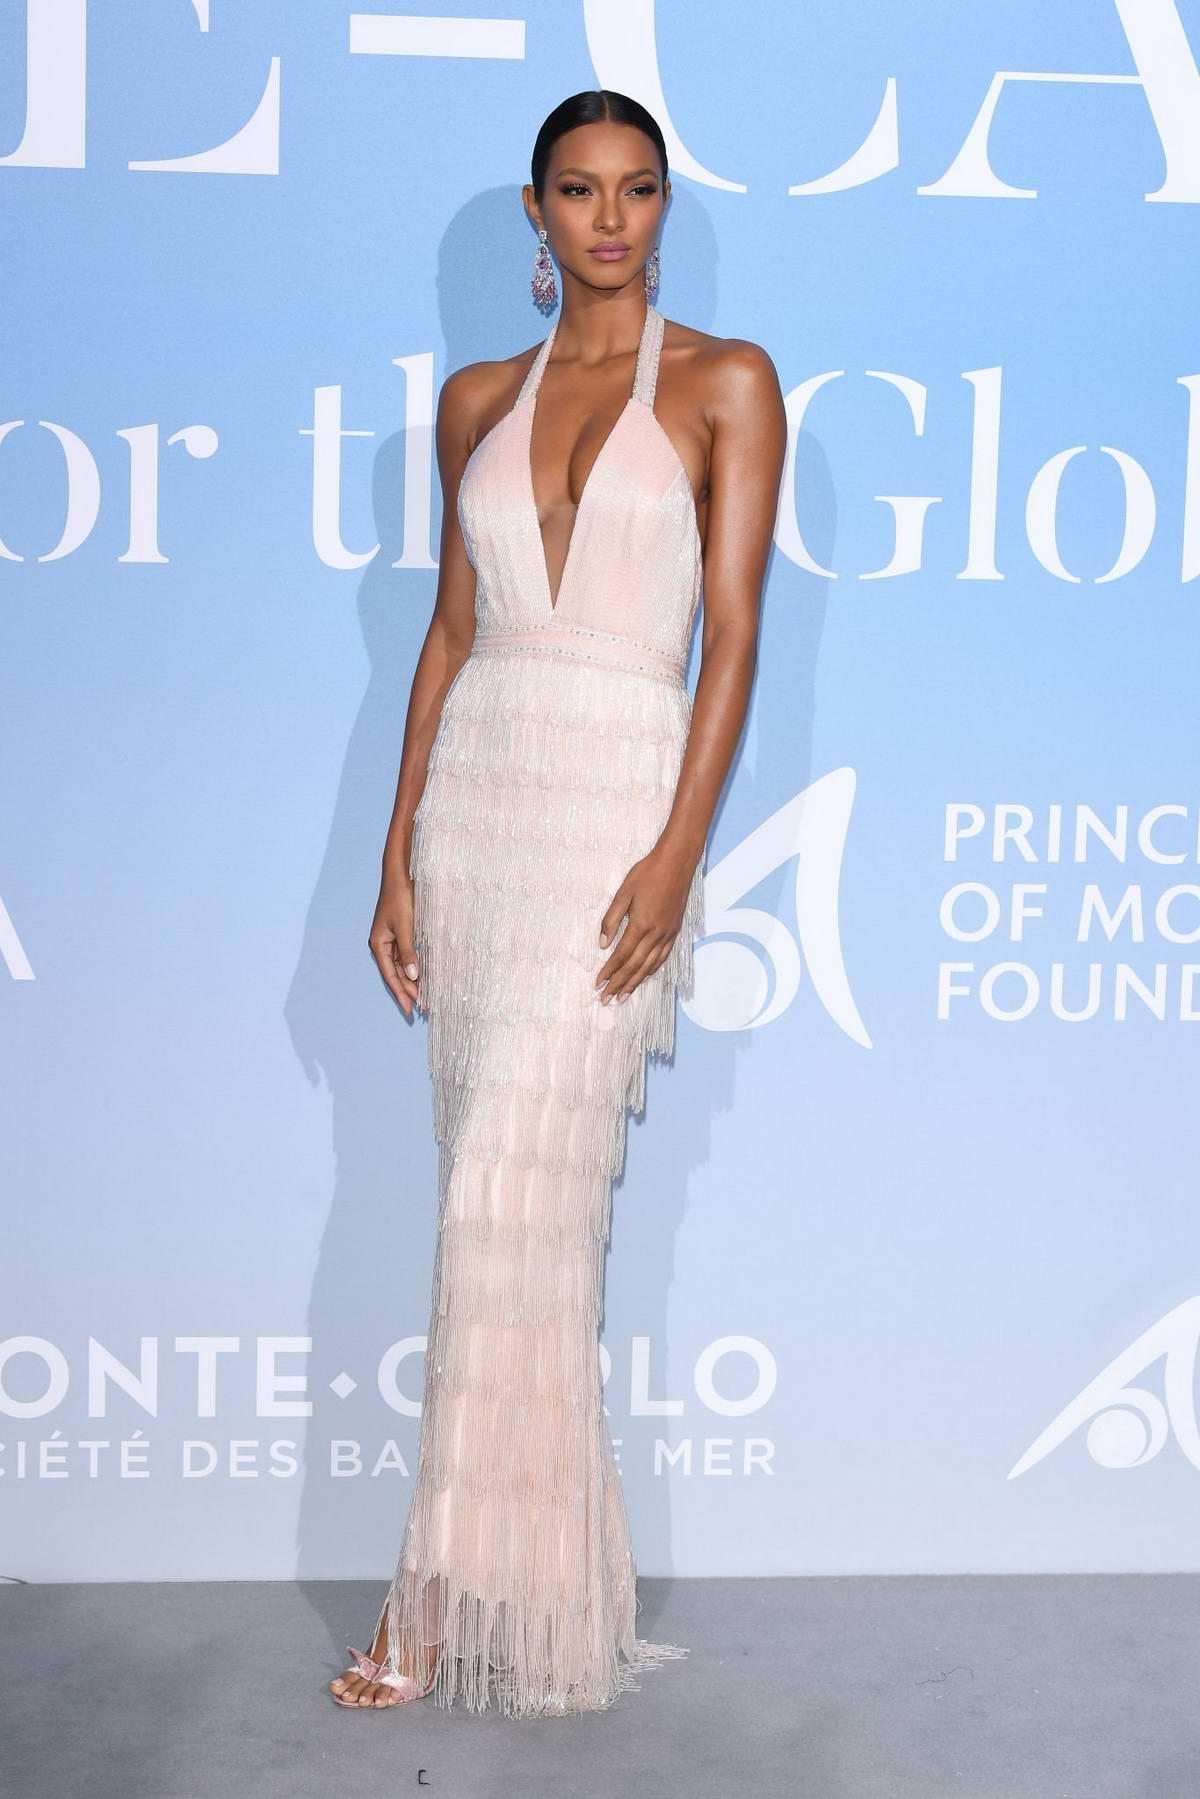 Lais Ribeiro attends the Gala For The Global Ocean in Monte Carlo, Monaco